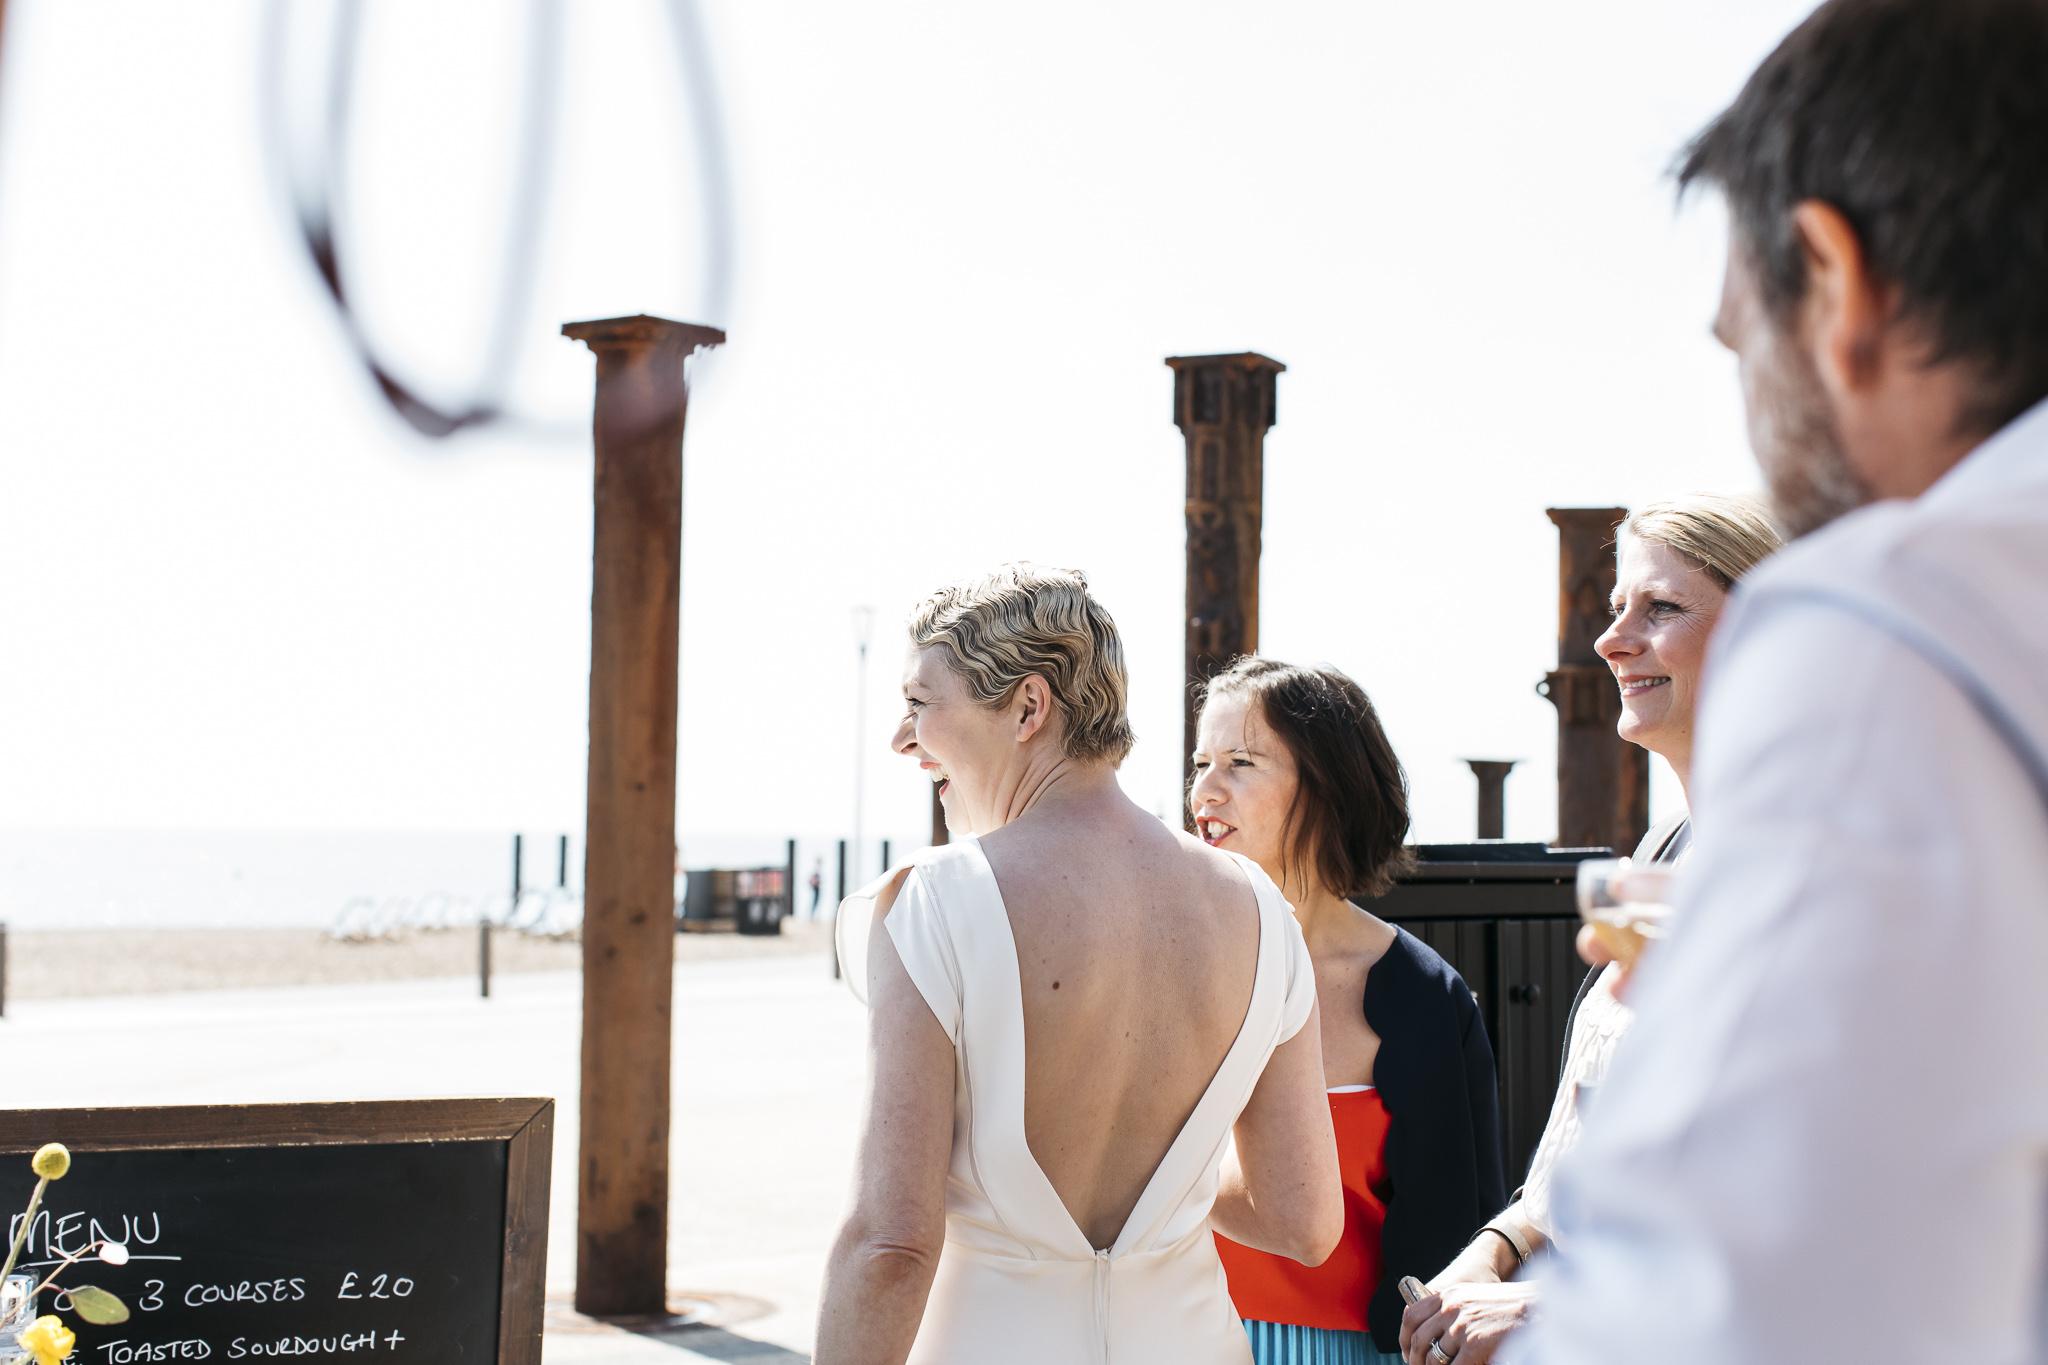 short_coverage_wedding_photographer_brighton_039.jpg